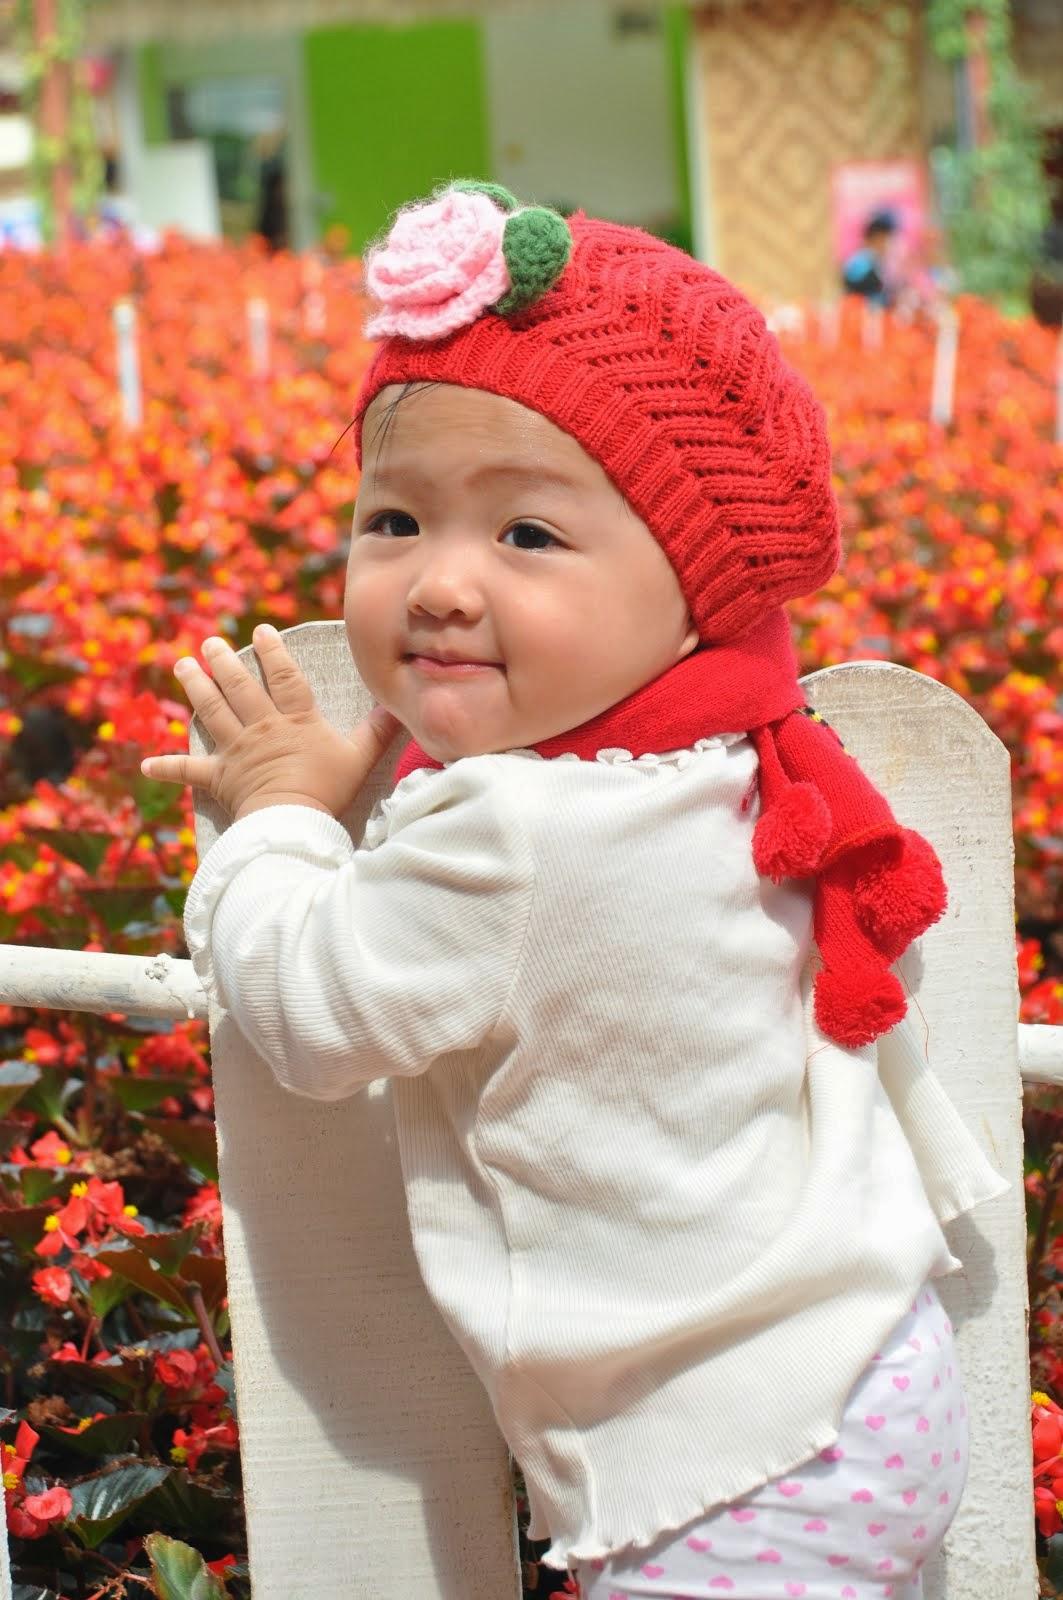 Firashaiyra Ihdina : : 11 months